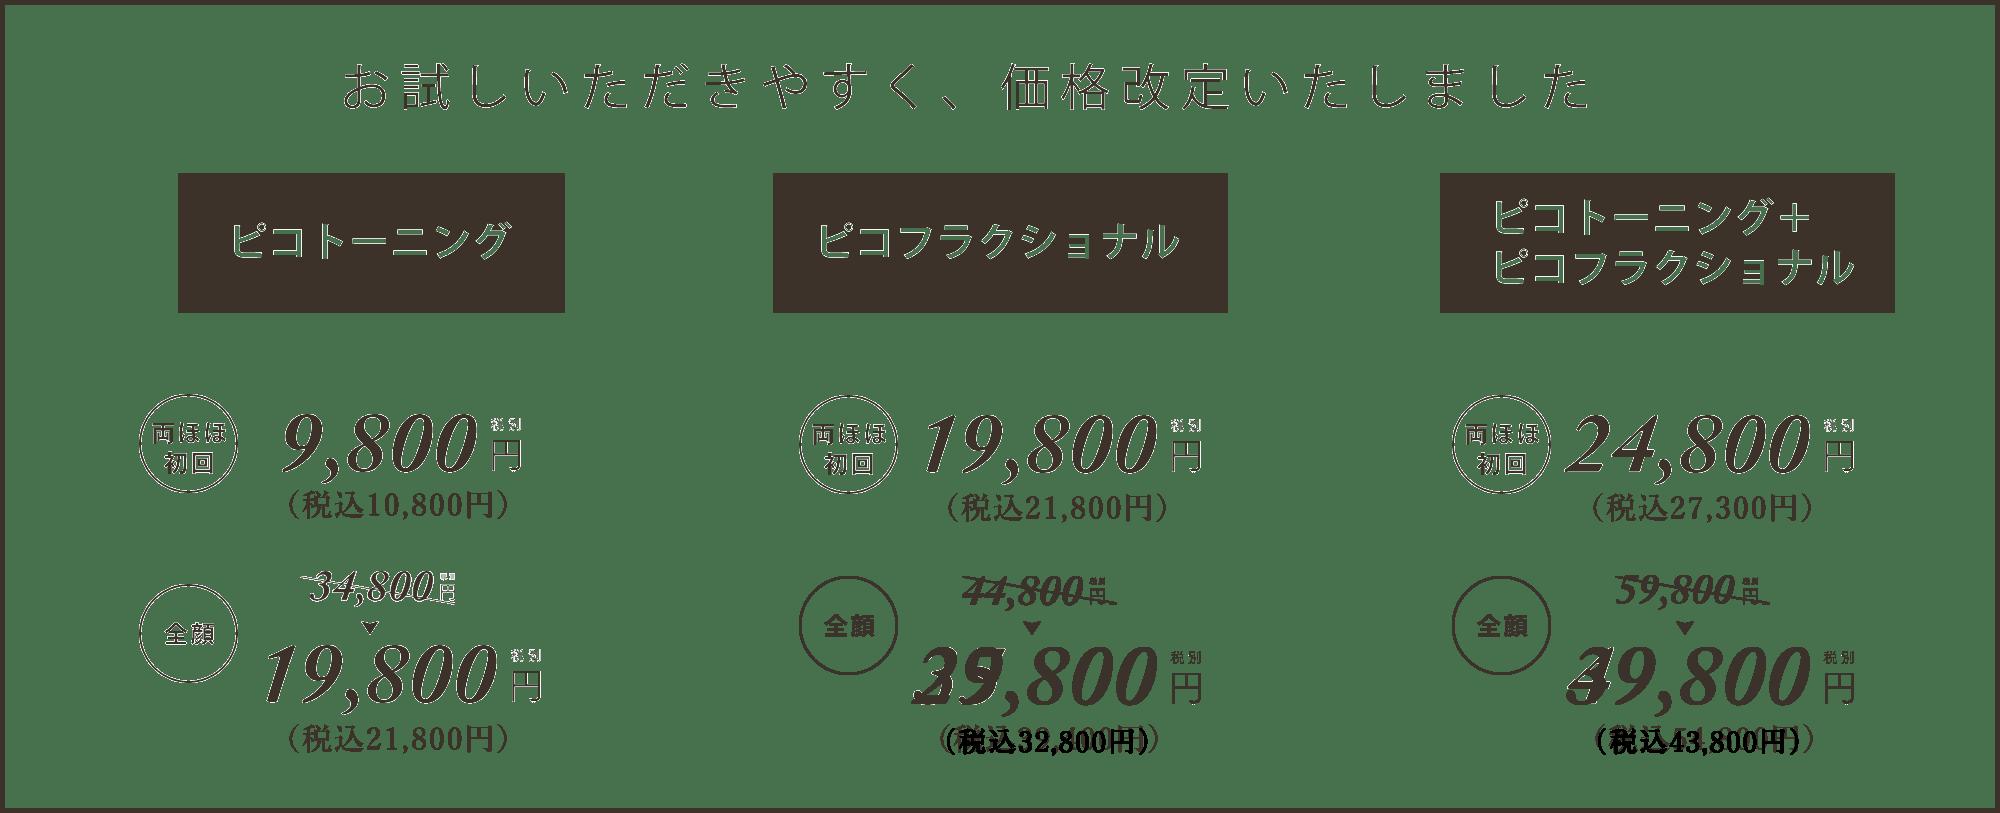 PICO LASER 価格改定